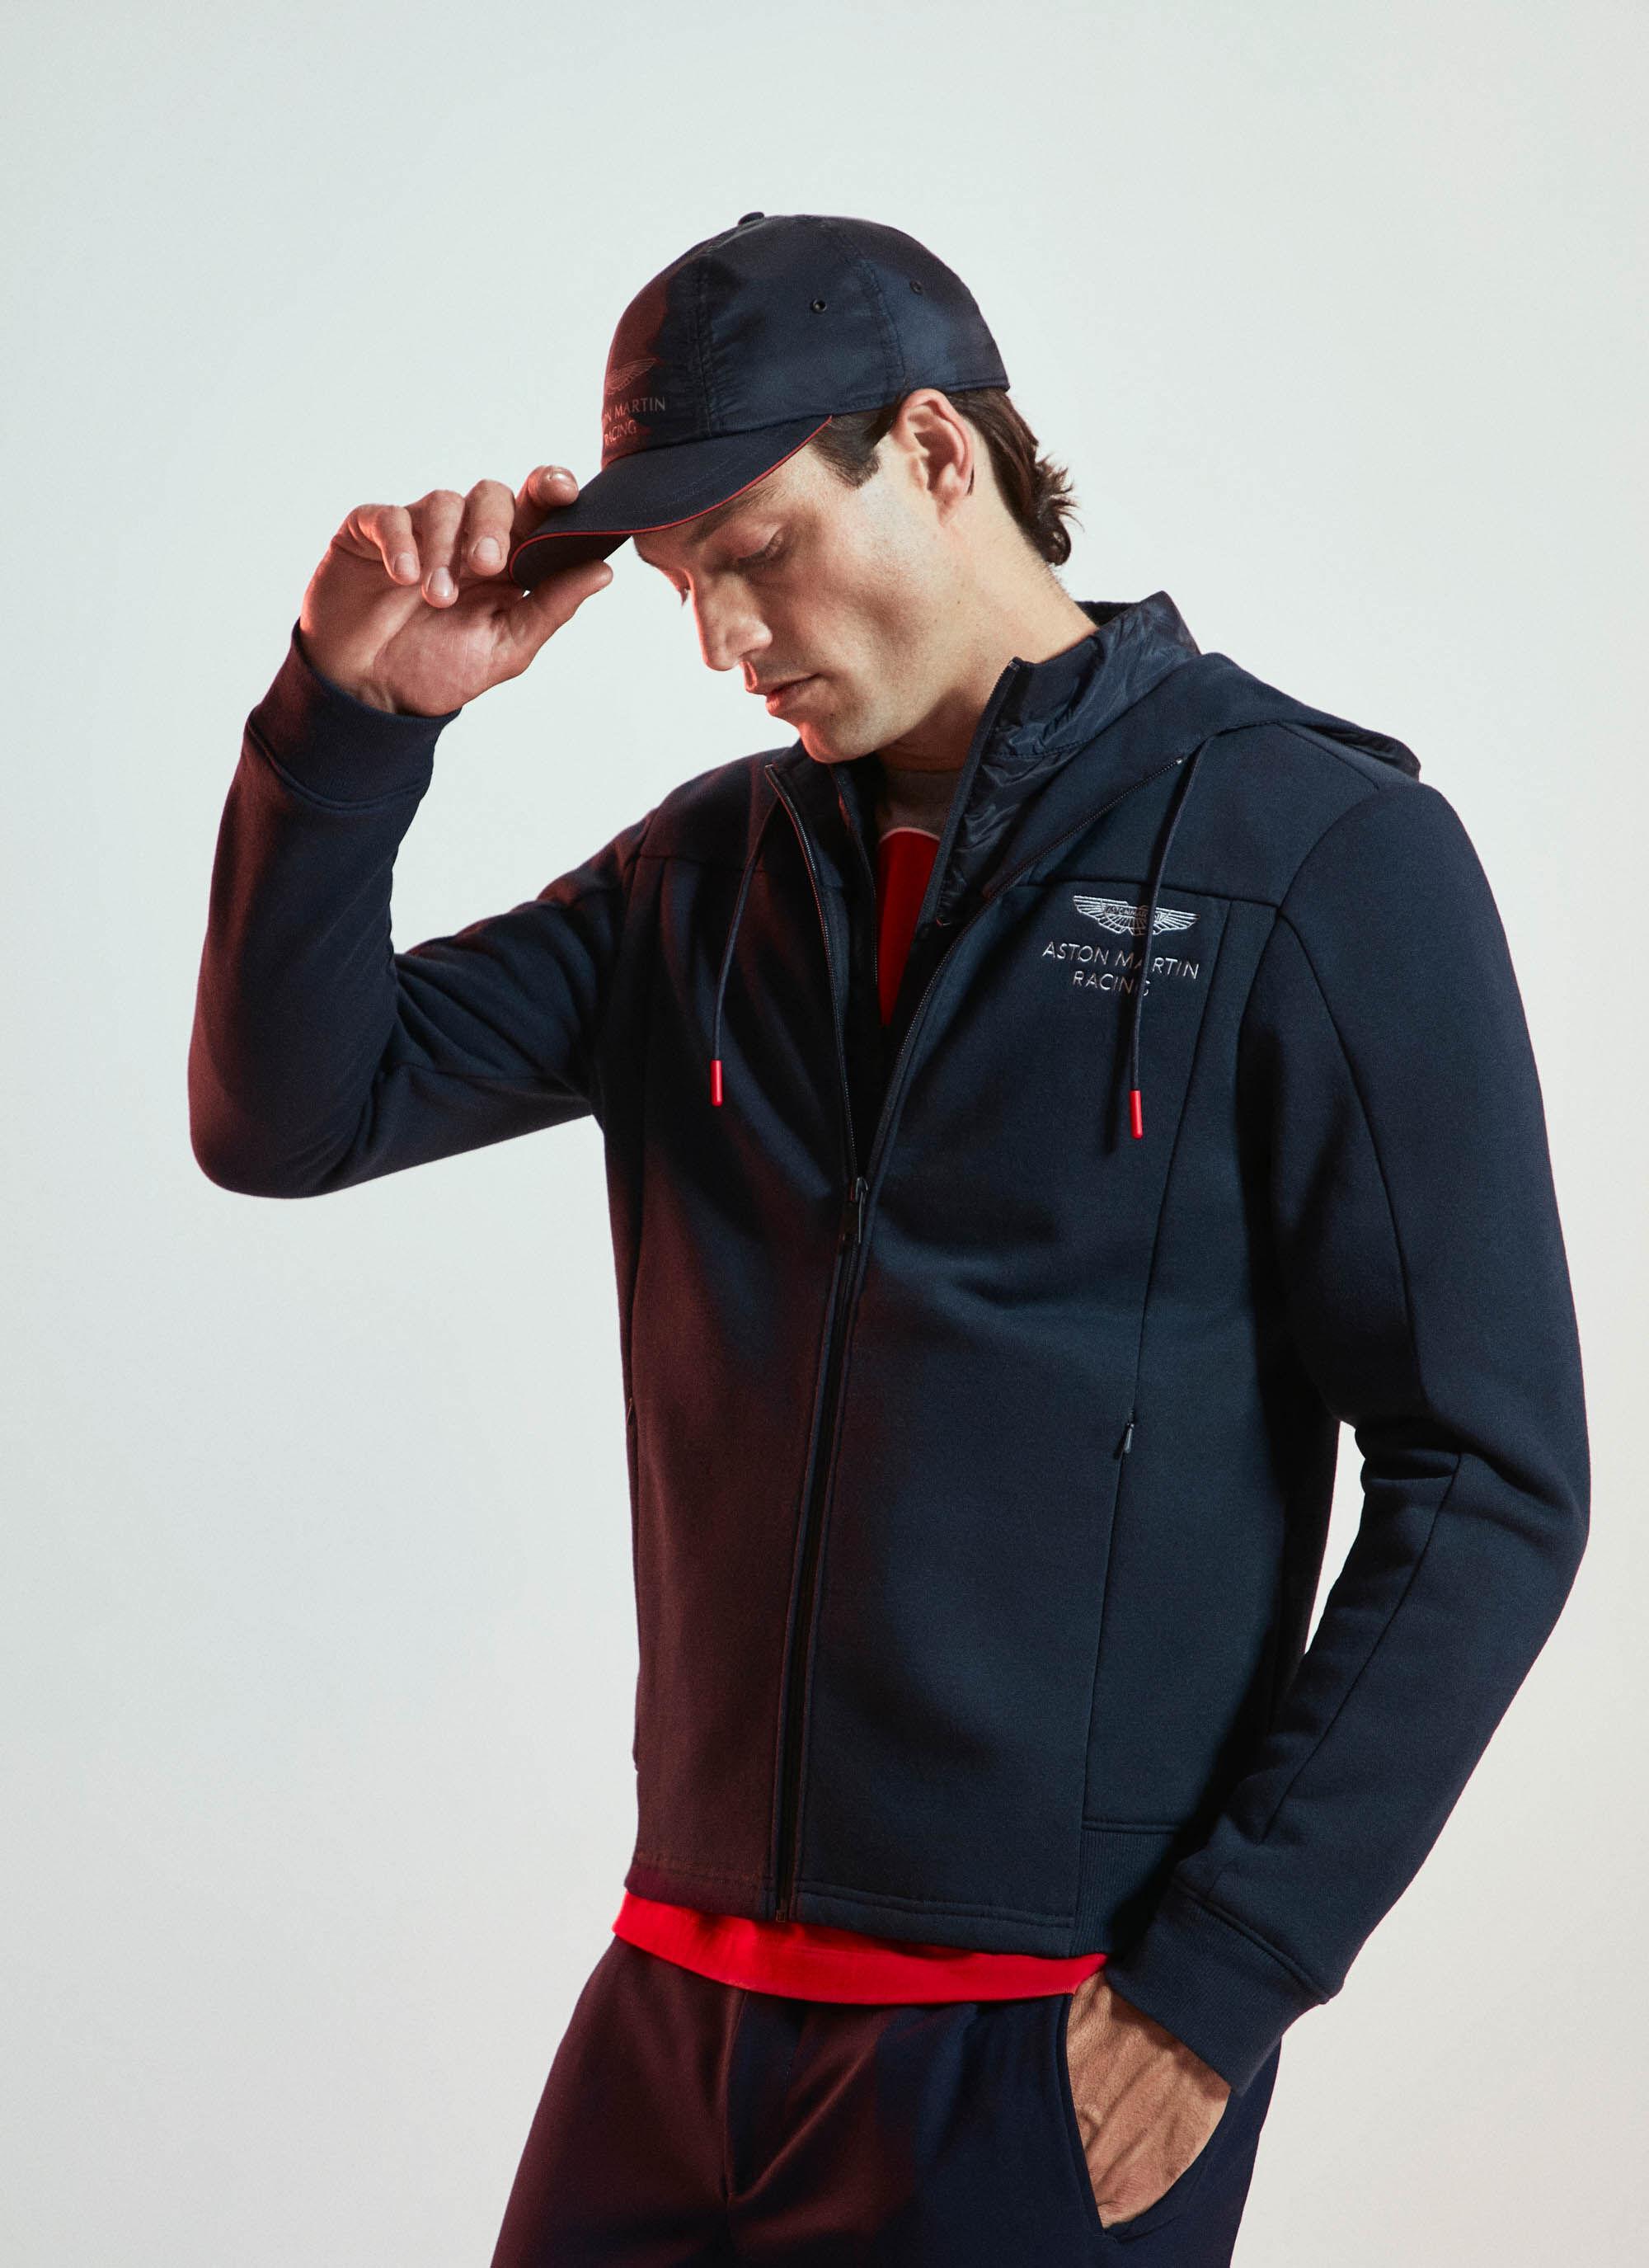 aston martin racing men's cotton blend zipped hybrid hoodie | large | navy